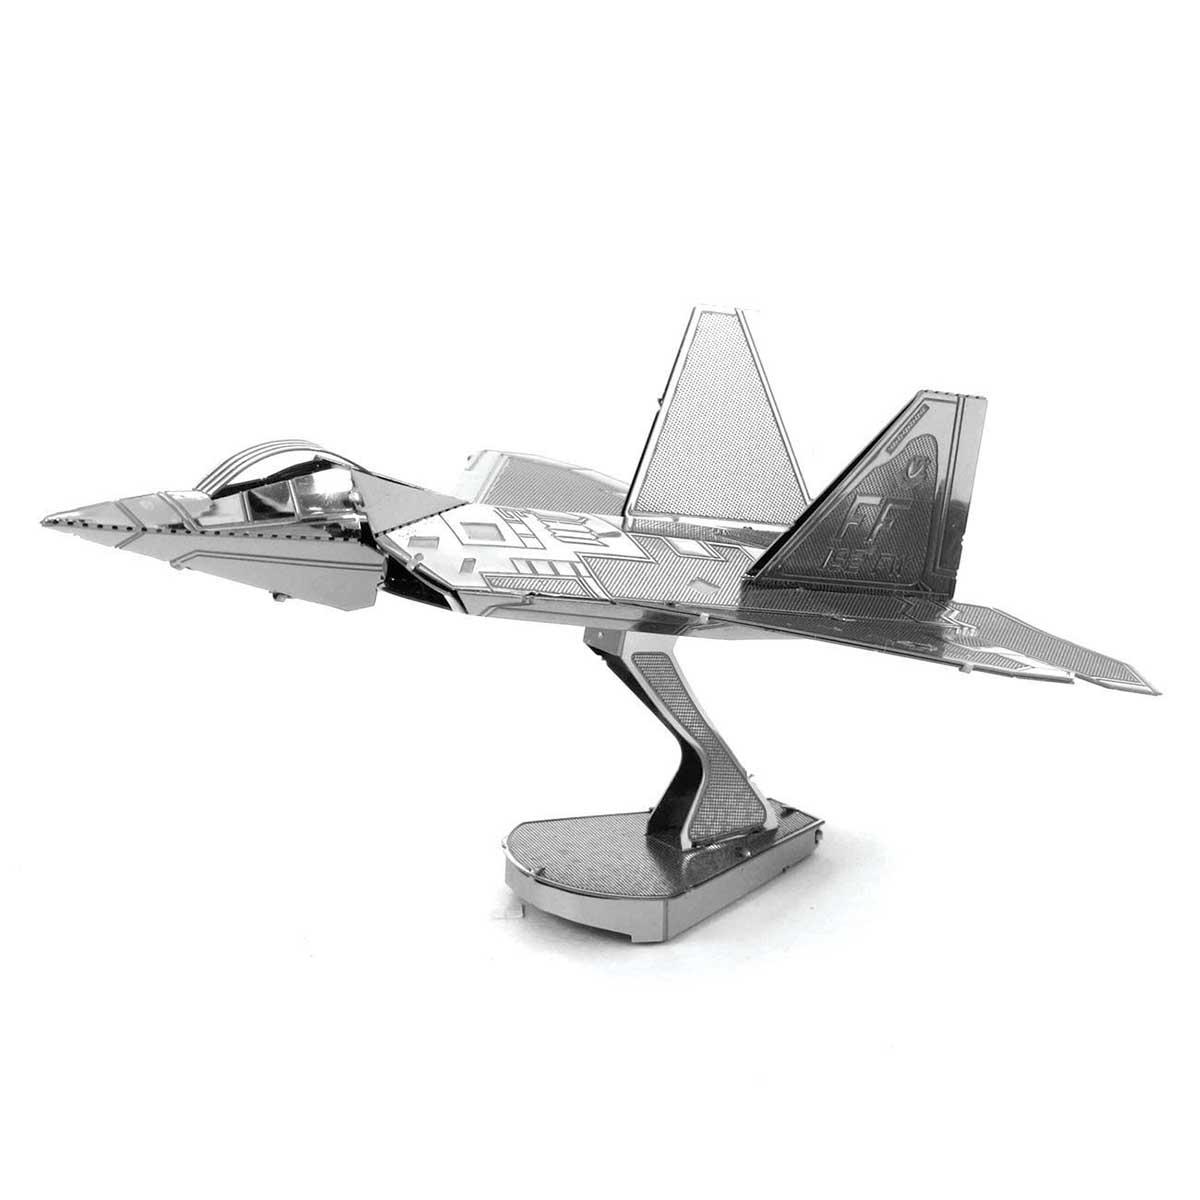 F-22 Raptor Planes Metal Puzzles